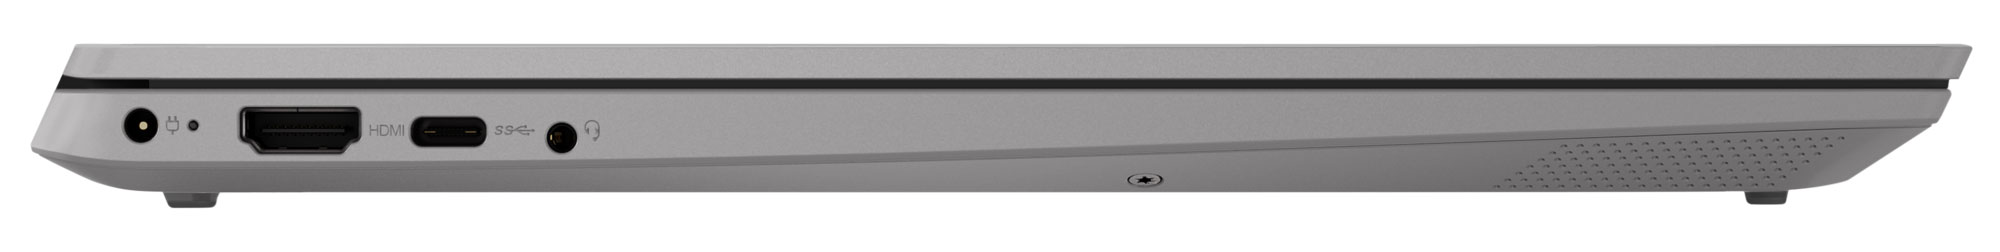 Фото  Ноутбук Lenovo ideapad S340-15IILD Platinum Grey (81WL0059RE)